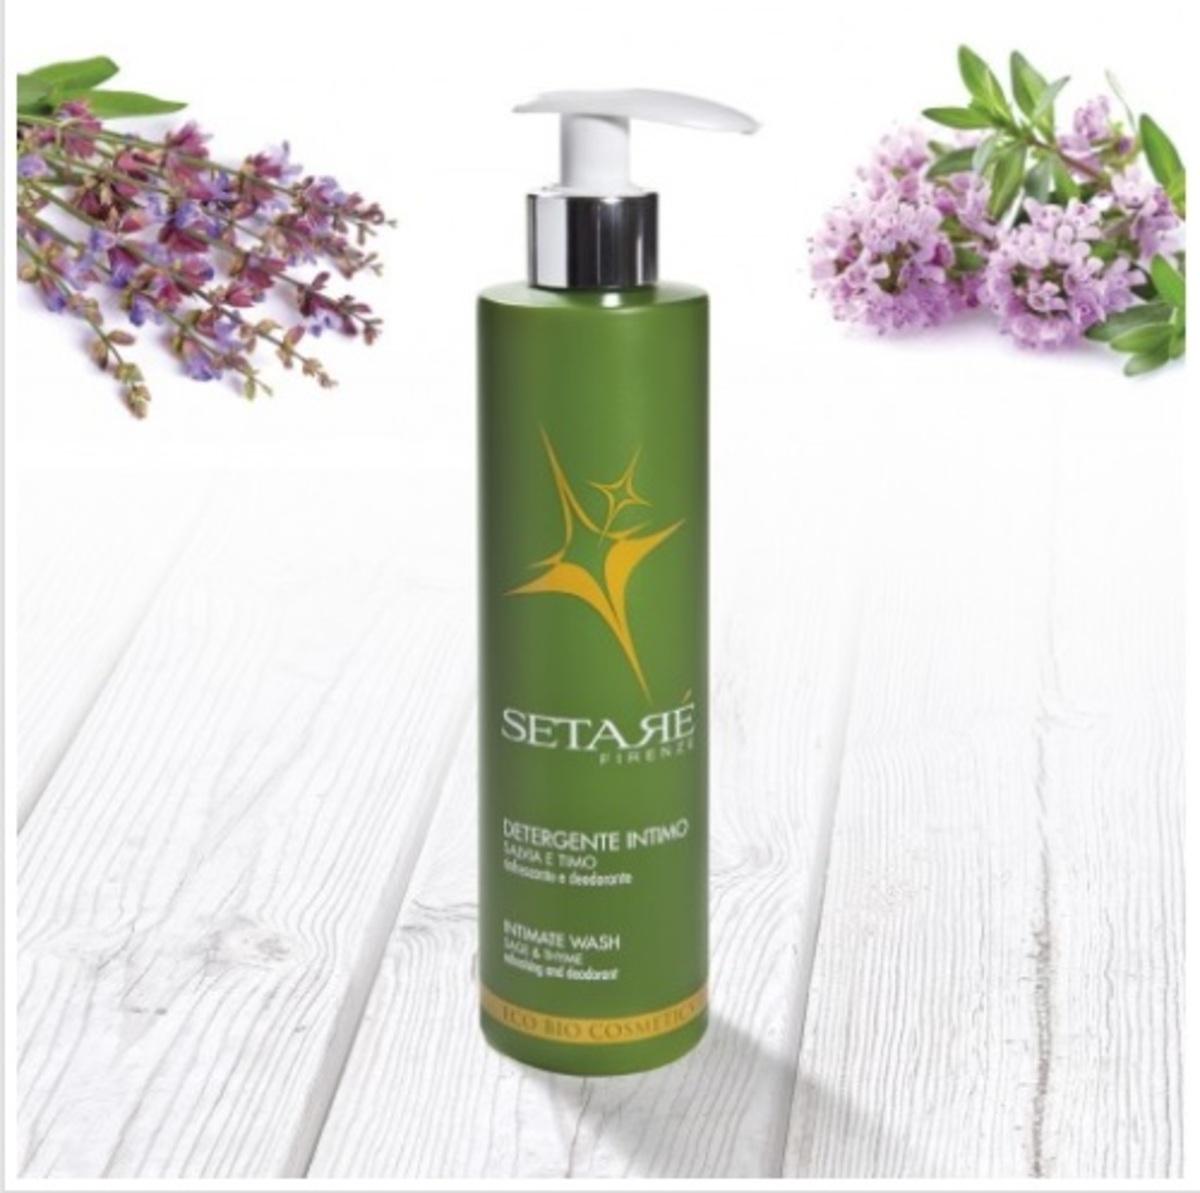 【Italy natural】Intimate Wash 250ml-[Italy natural product]